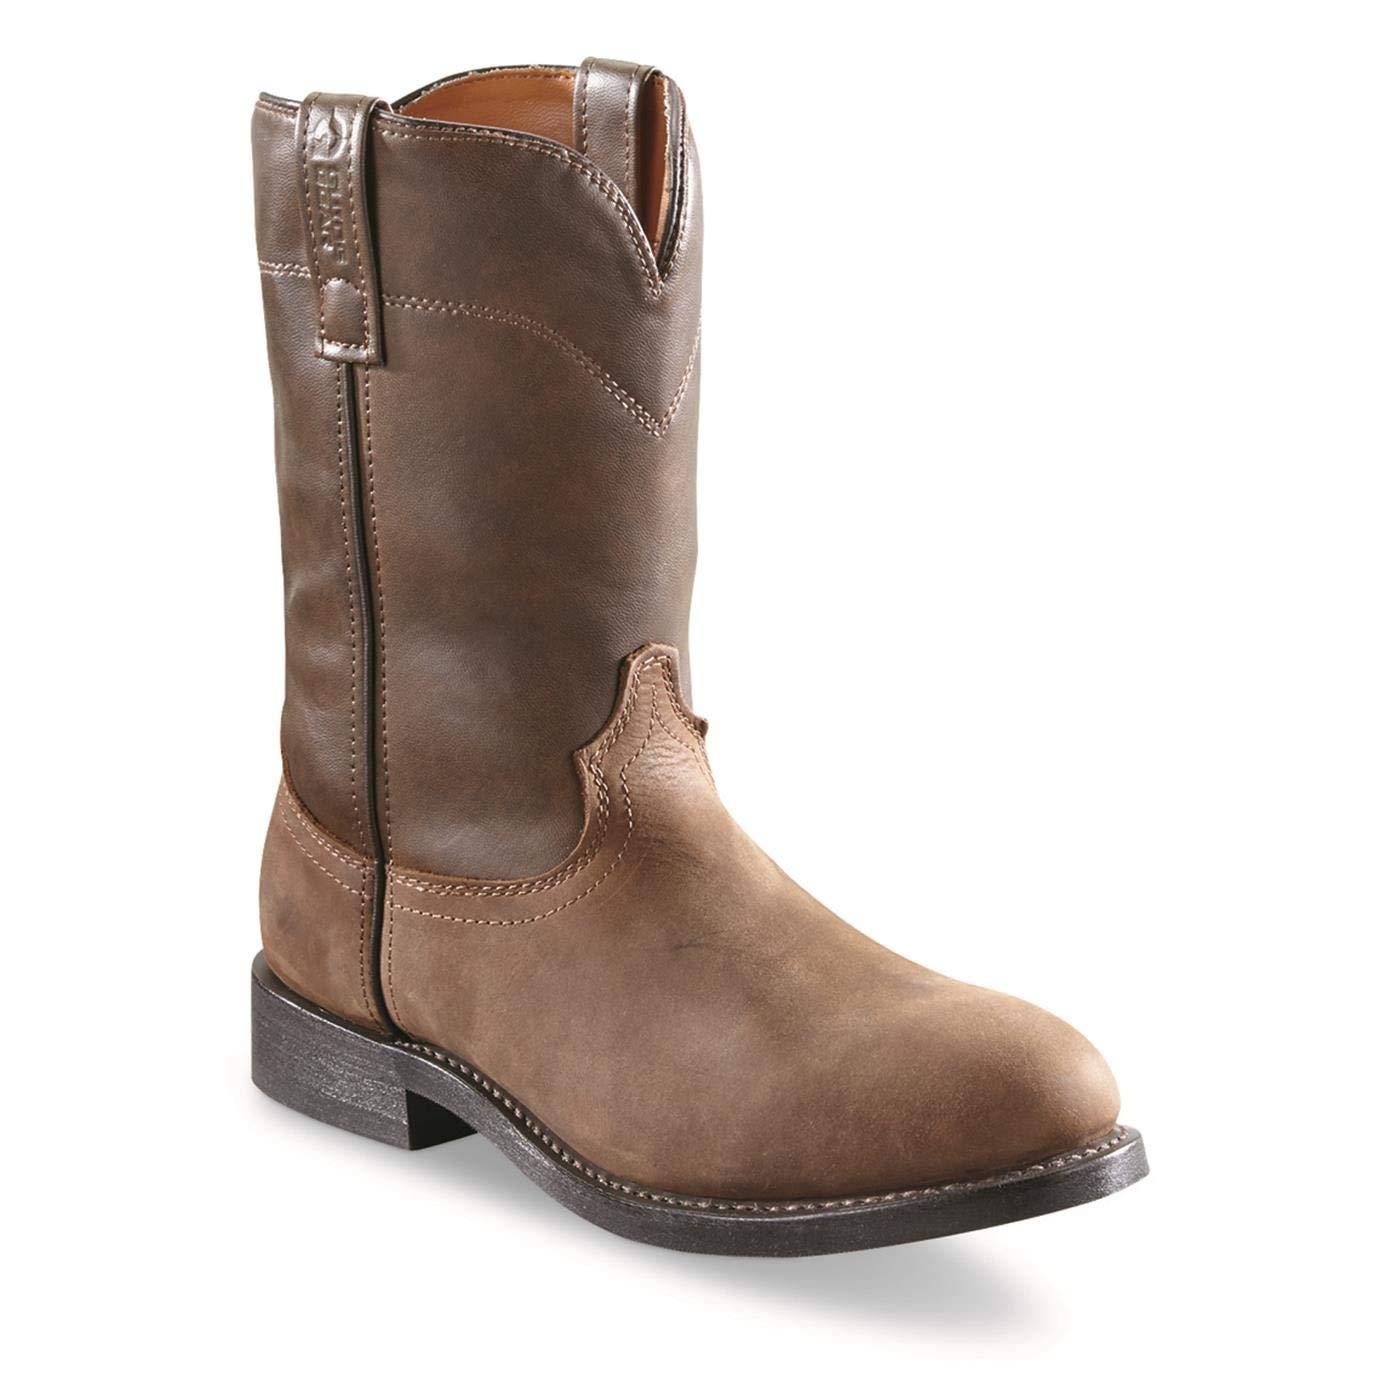 8cc8f5860 Amazon.com | Guide Gear Men's Roper Western Boots | Western